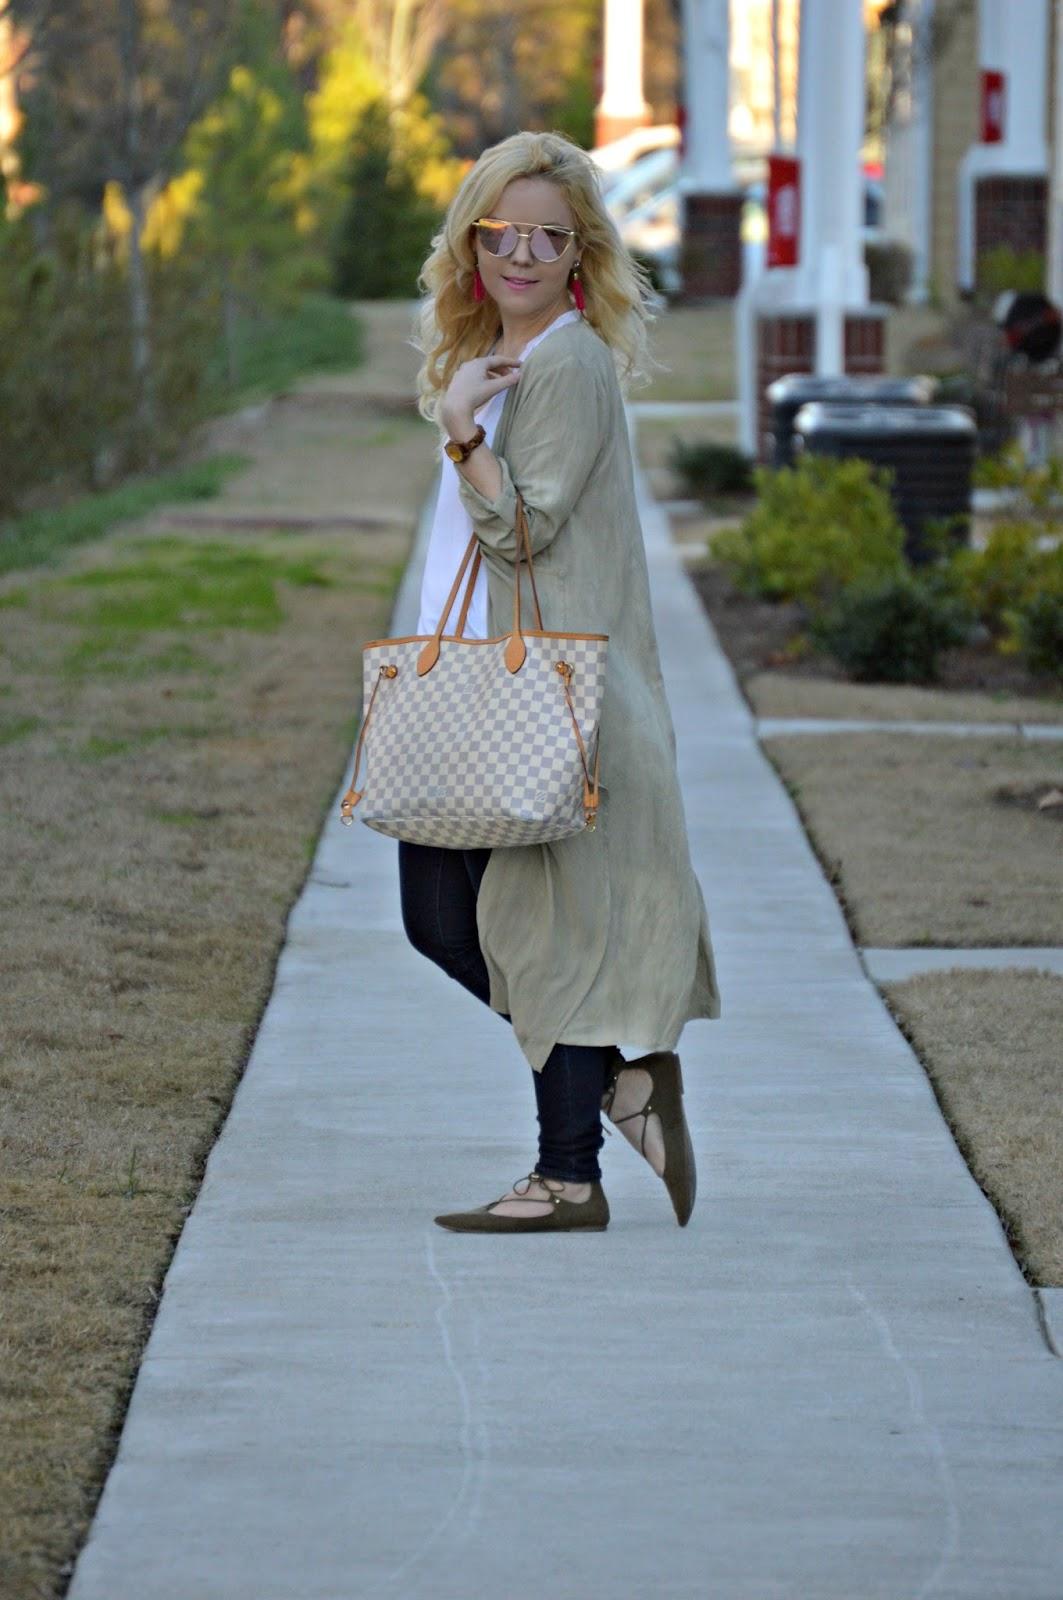 Ashley's Passion for Fashion